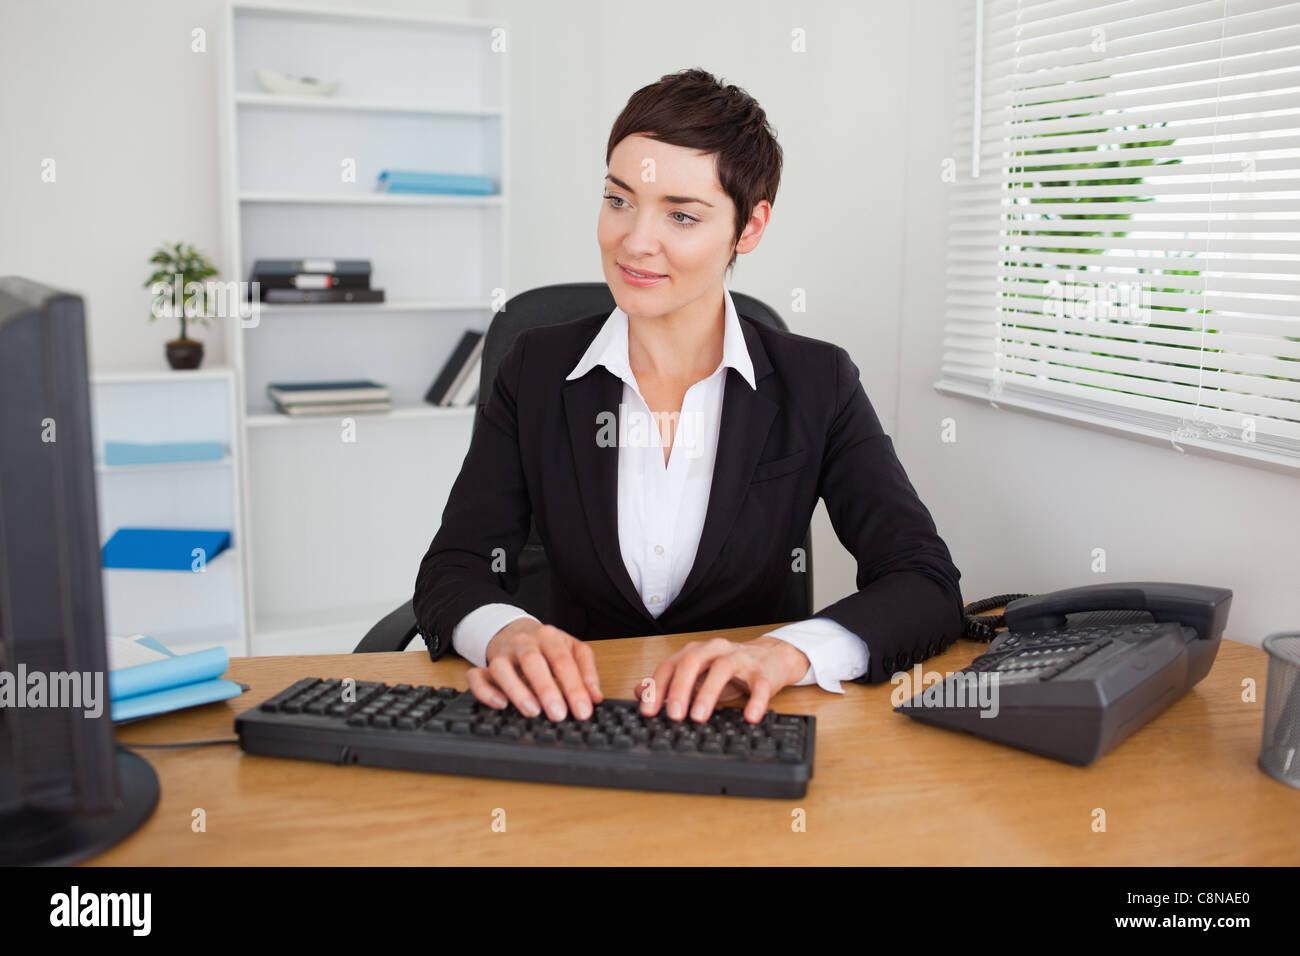 Charming secretary typing on her keybord - Stock Image